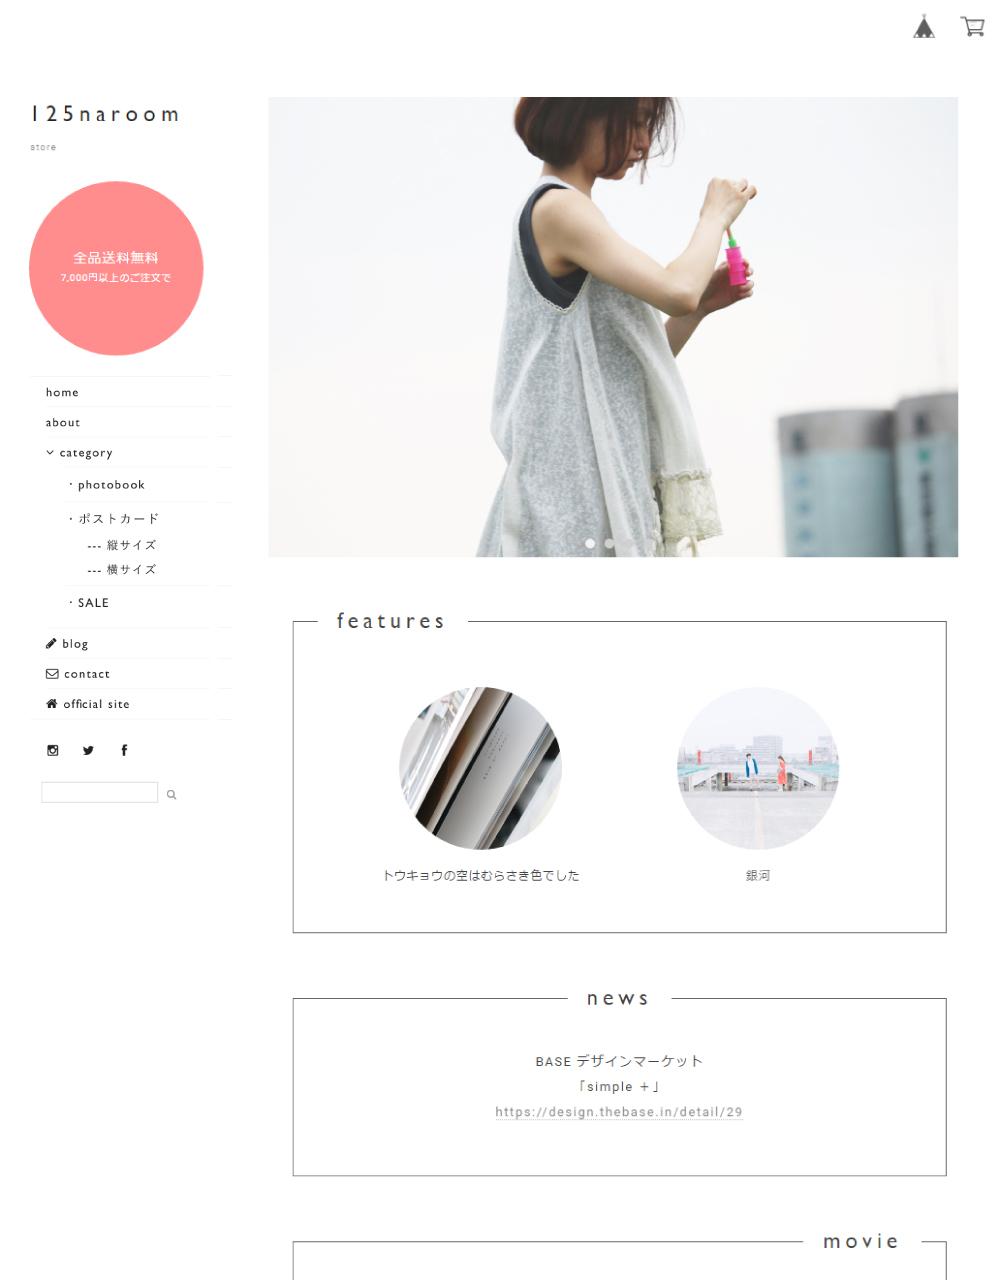 sample - 白背景 -